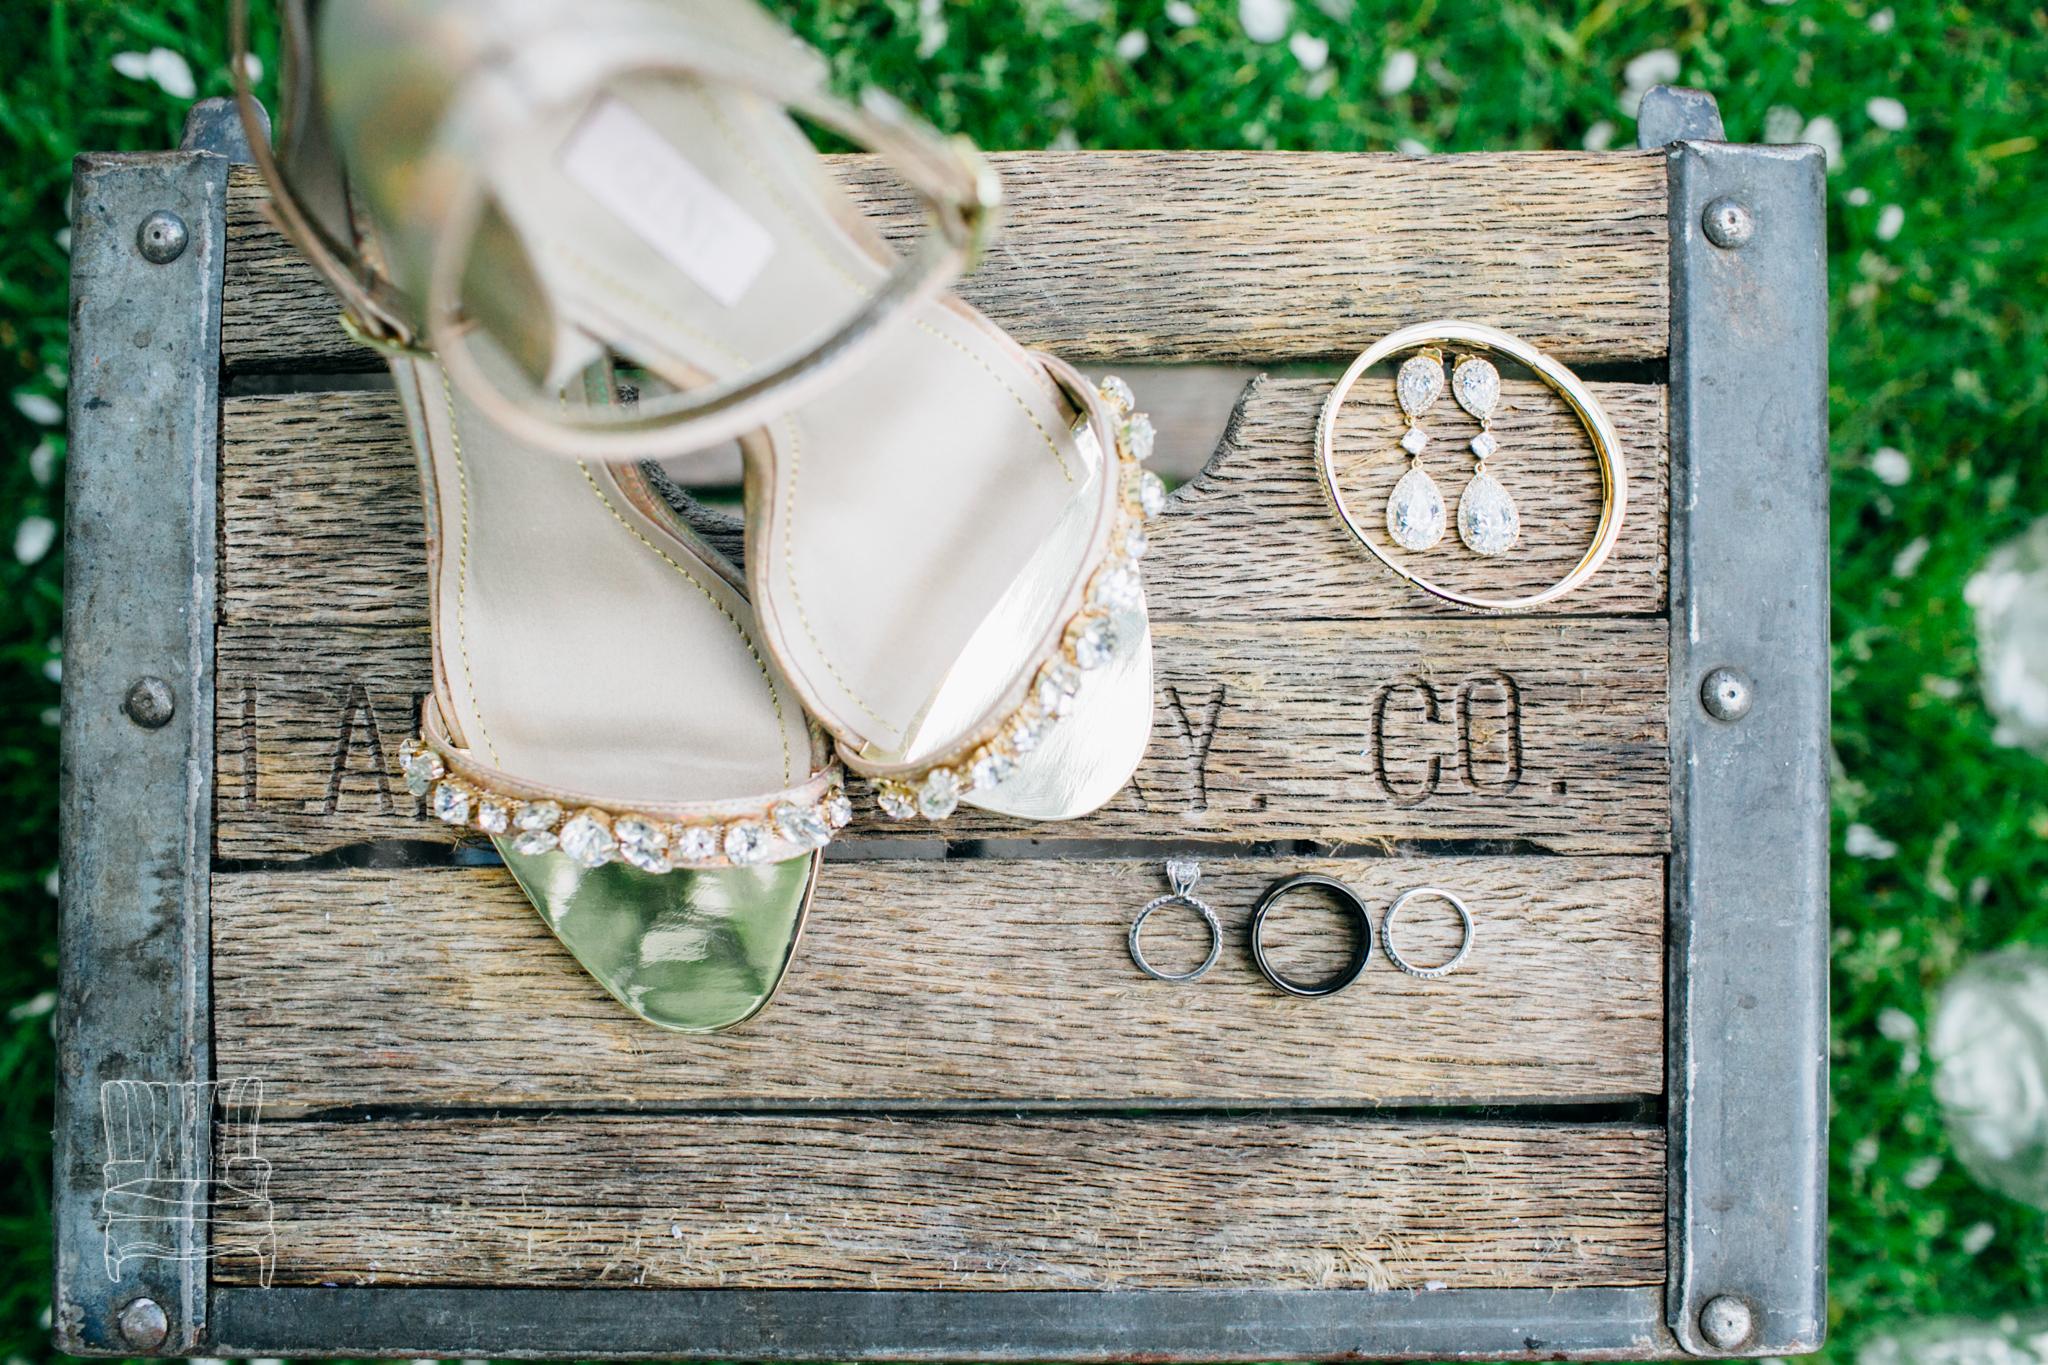 seattle-wedding-photographer-katheryn-moran-russells-bothell-wilkins-wedding-photo-6.jpg